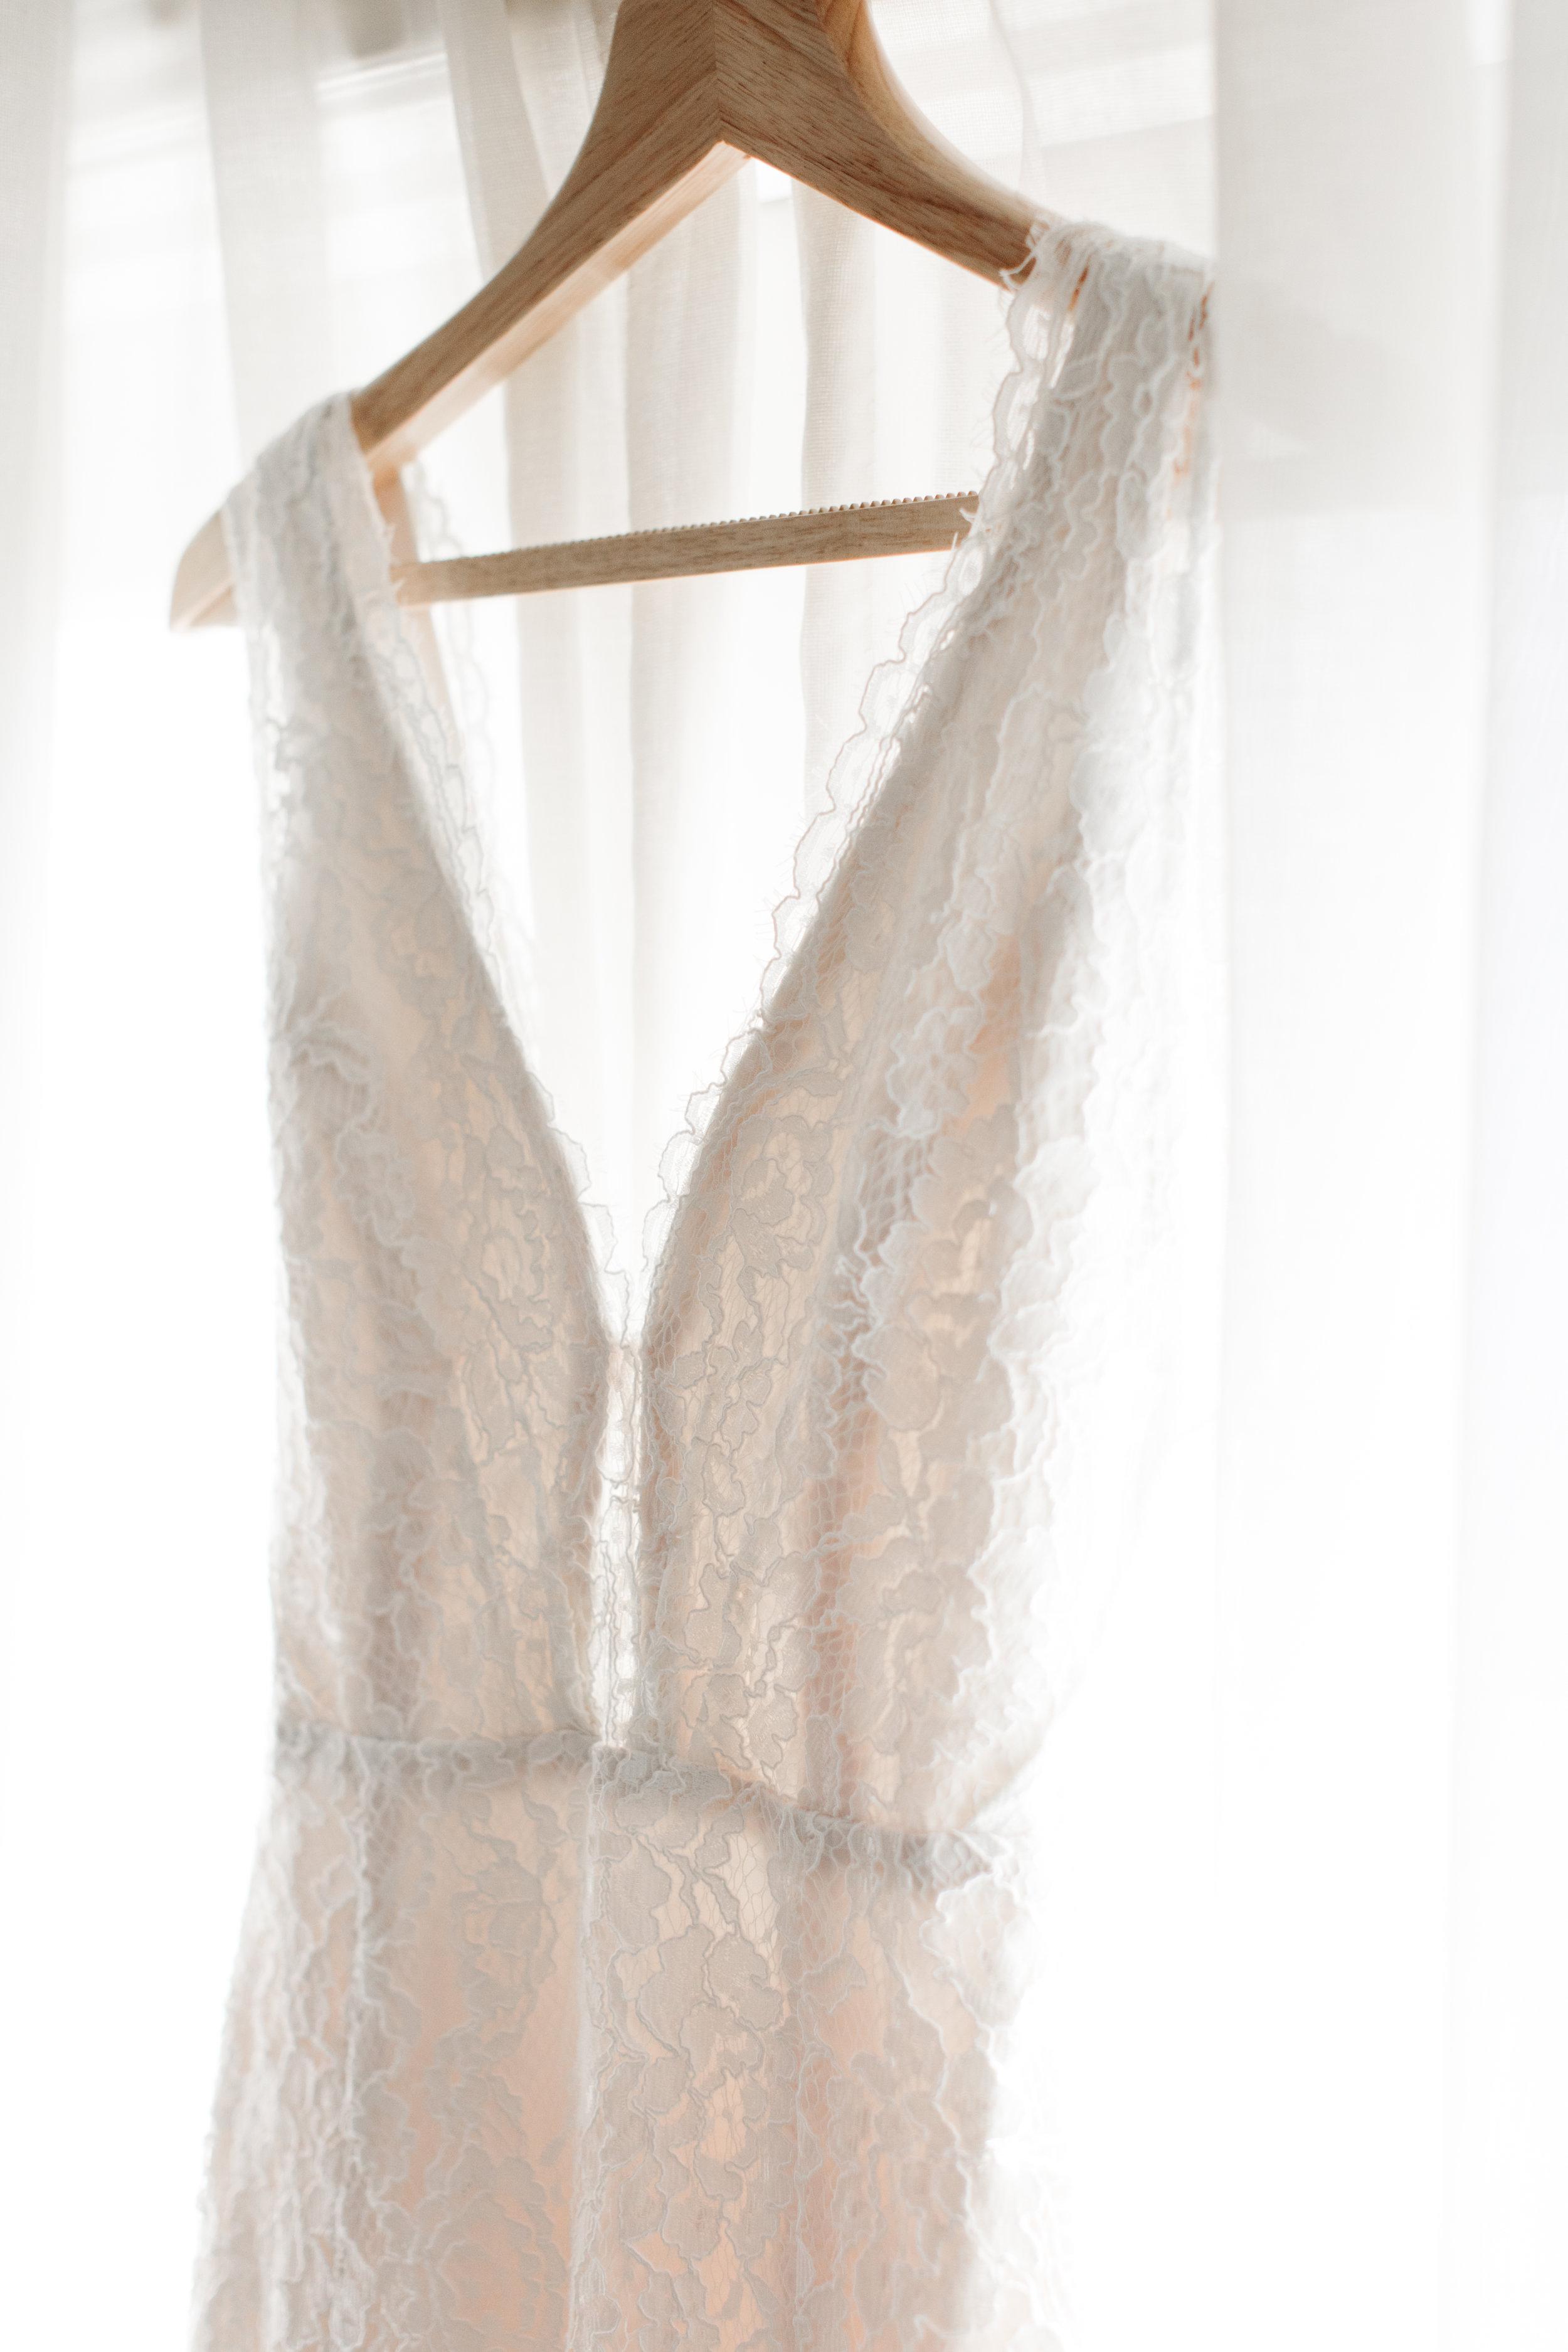 Wedding Dress Details - Dallas, Tx - Fall Wedding - Julian Leaver Events